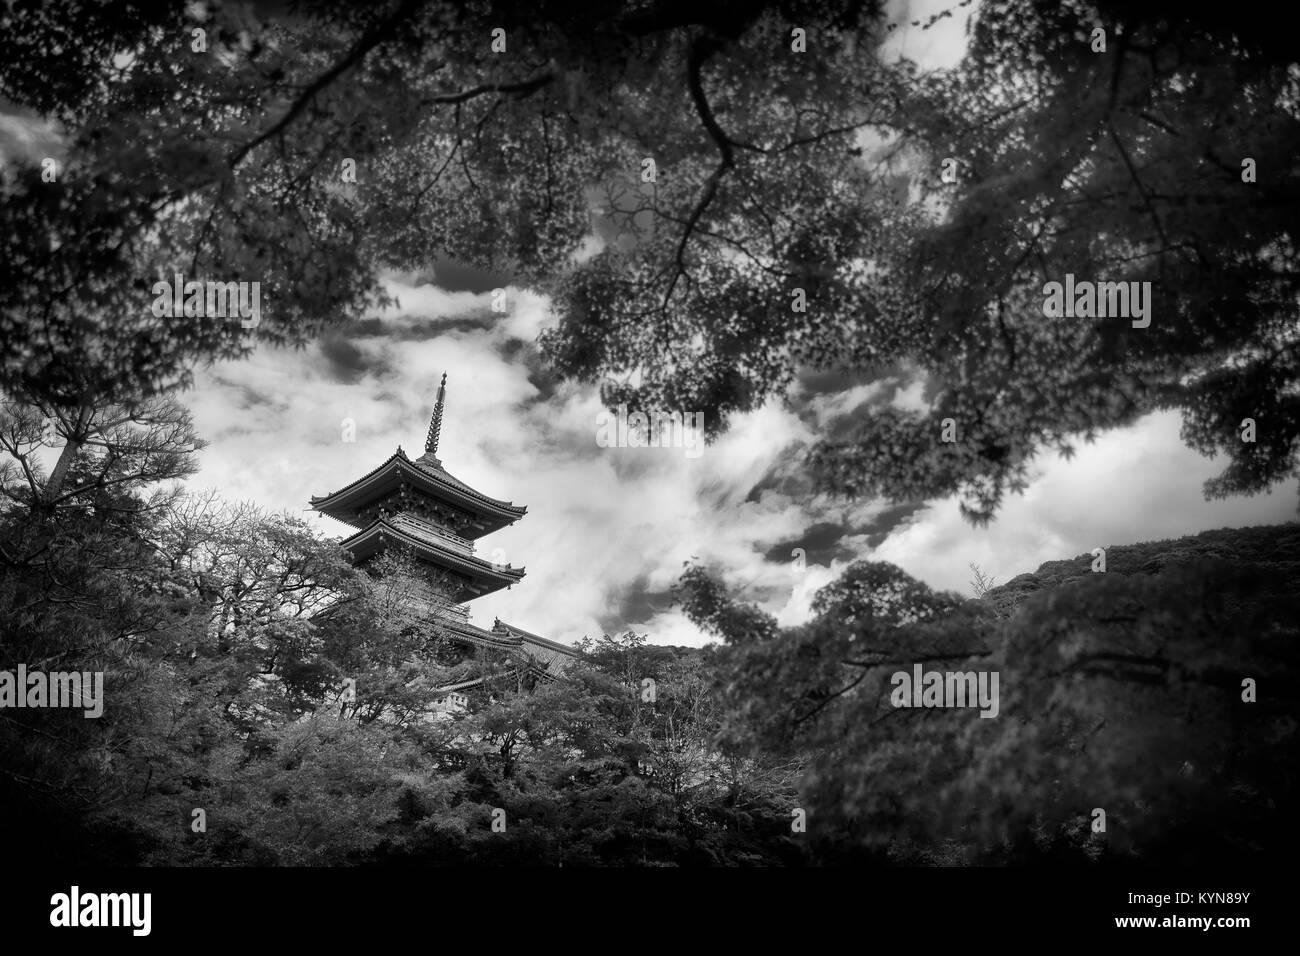 Dramatic artistic black and white photograph of sanjunoto pagoda of kiyomizu dera buddhist temple in kyoto japan in a beautiful scenery behind japane